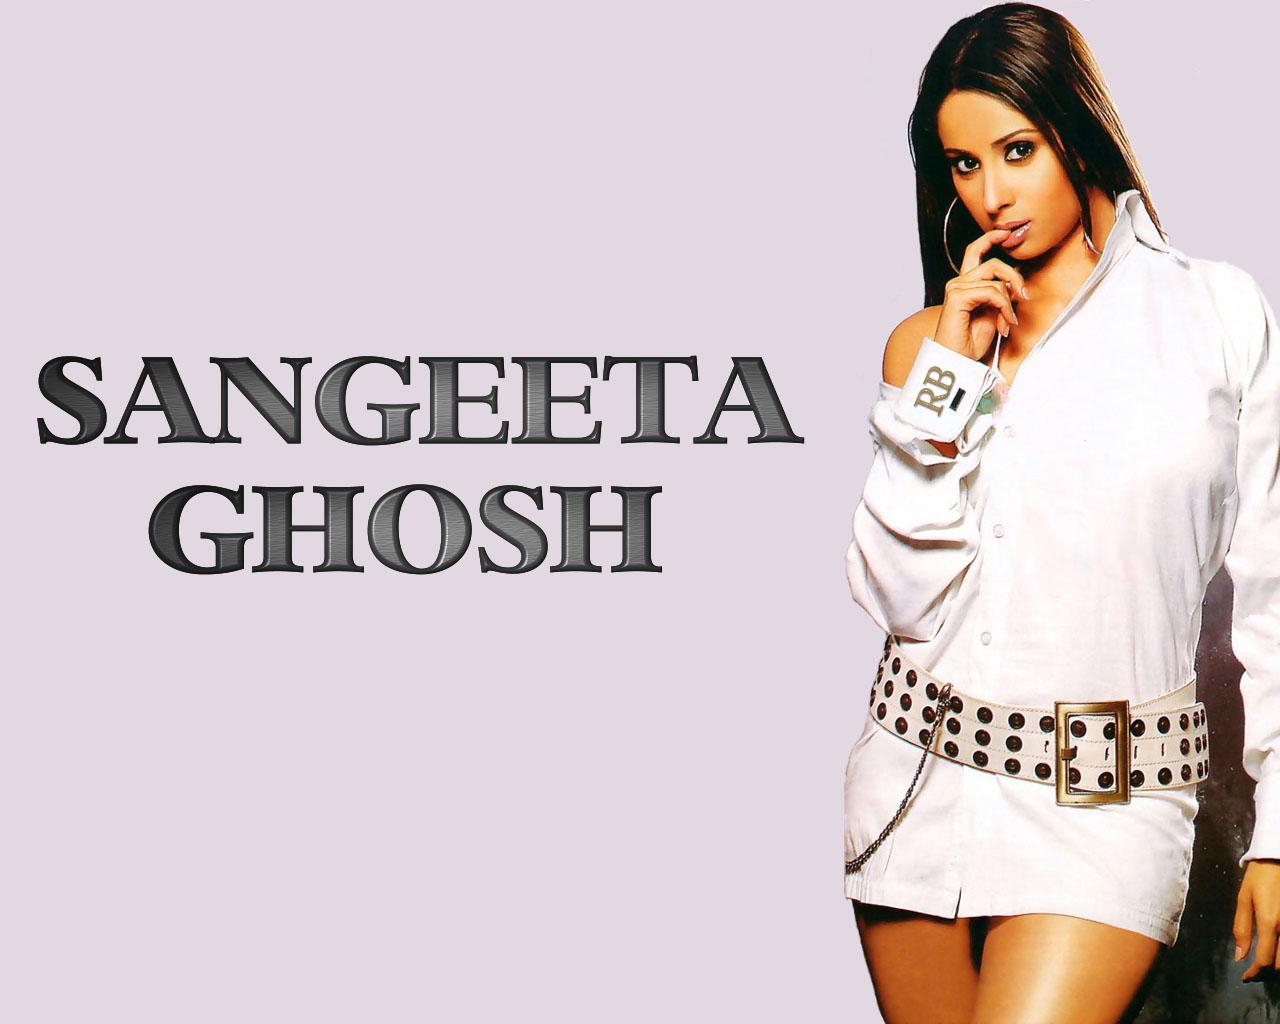 http://3.bp.blogspot.com/-nLRPYn8VsvQ/ThrXWfGkWGI/AAAAAAAAFaY/vlbpuu2U_S8/s1600/Bollywood+Actress+super+Wallpapers20.jpg